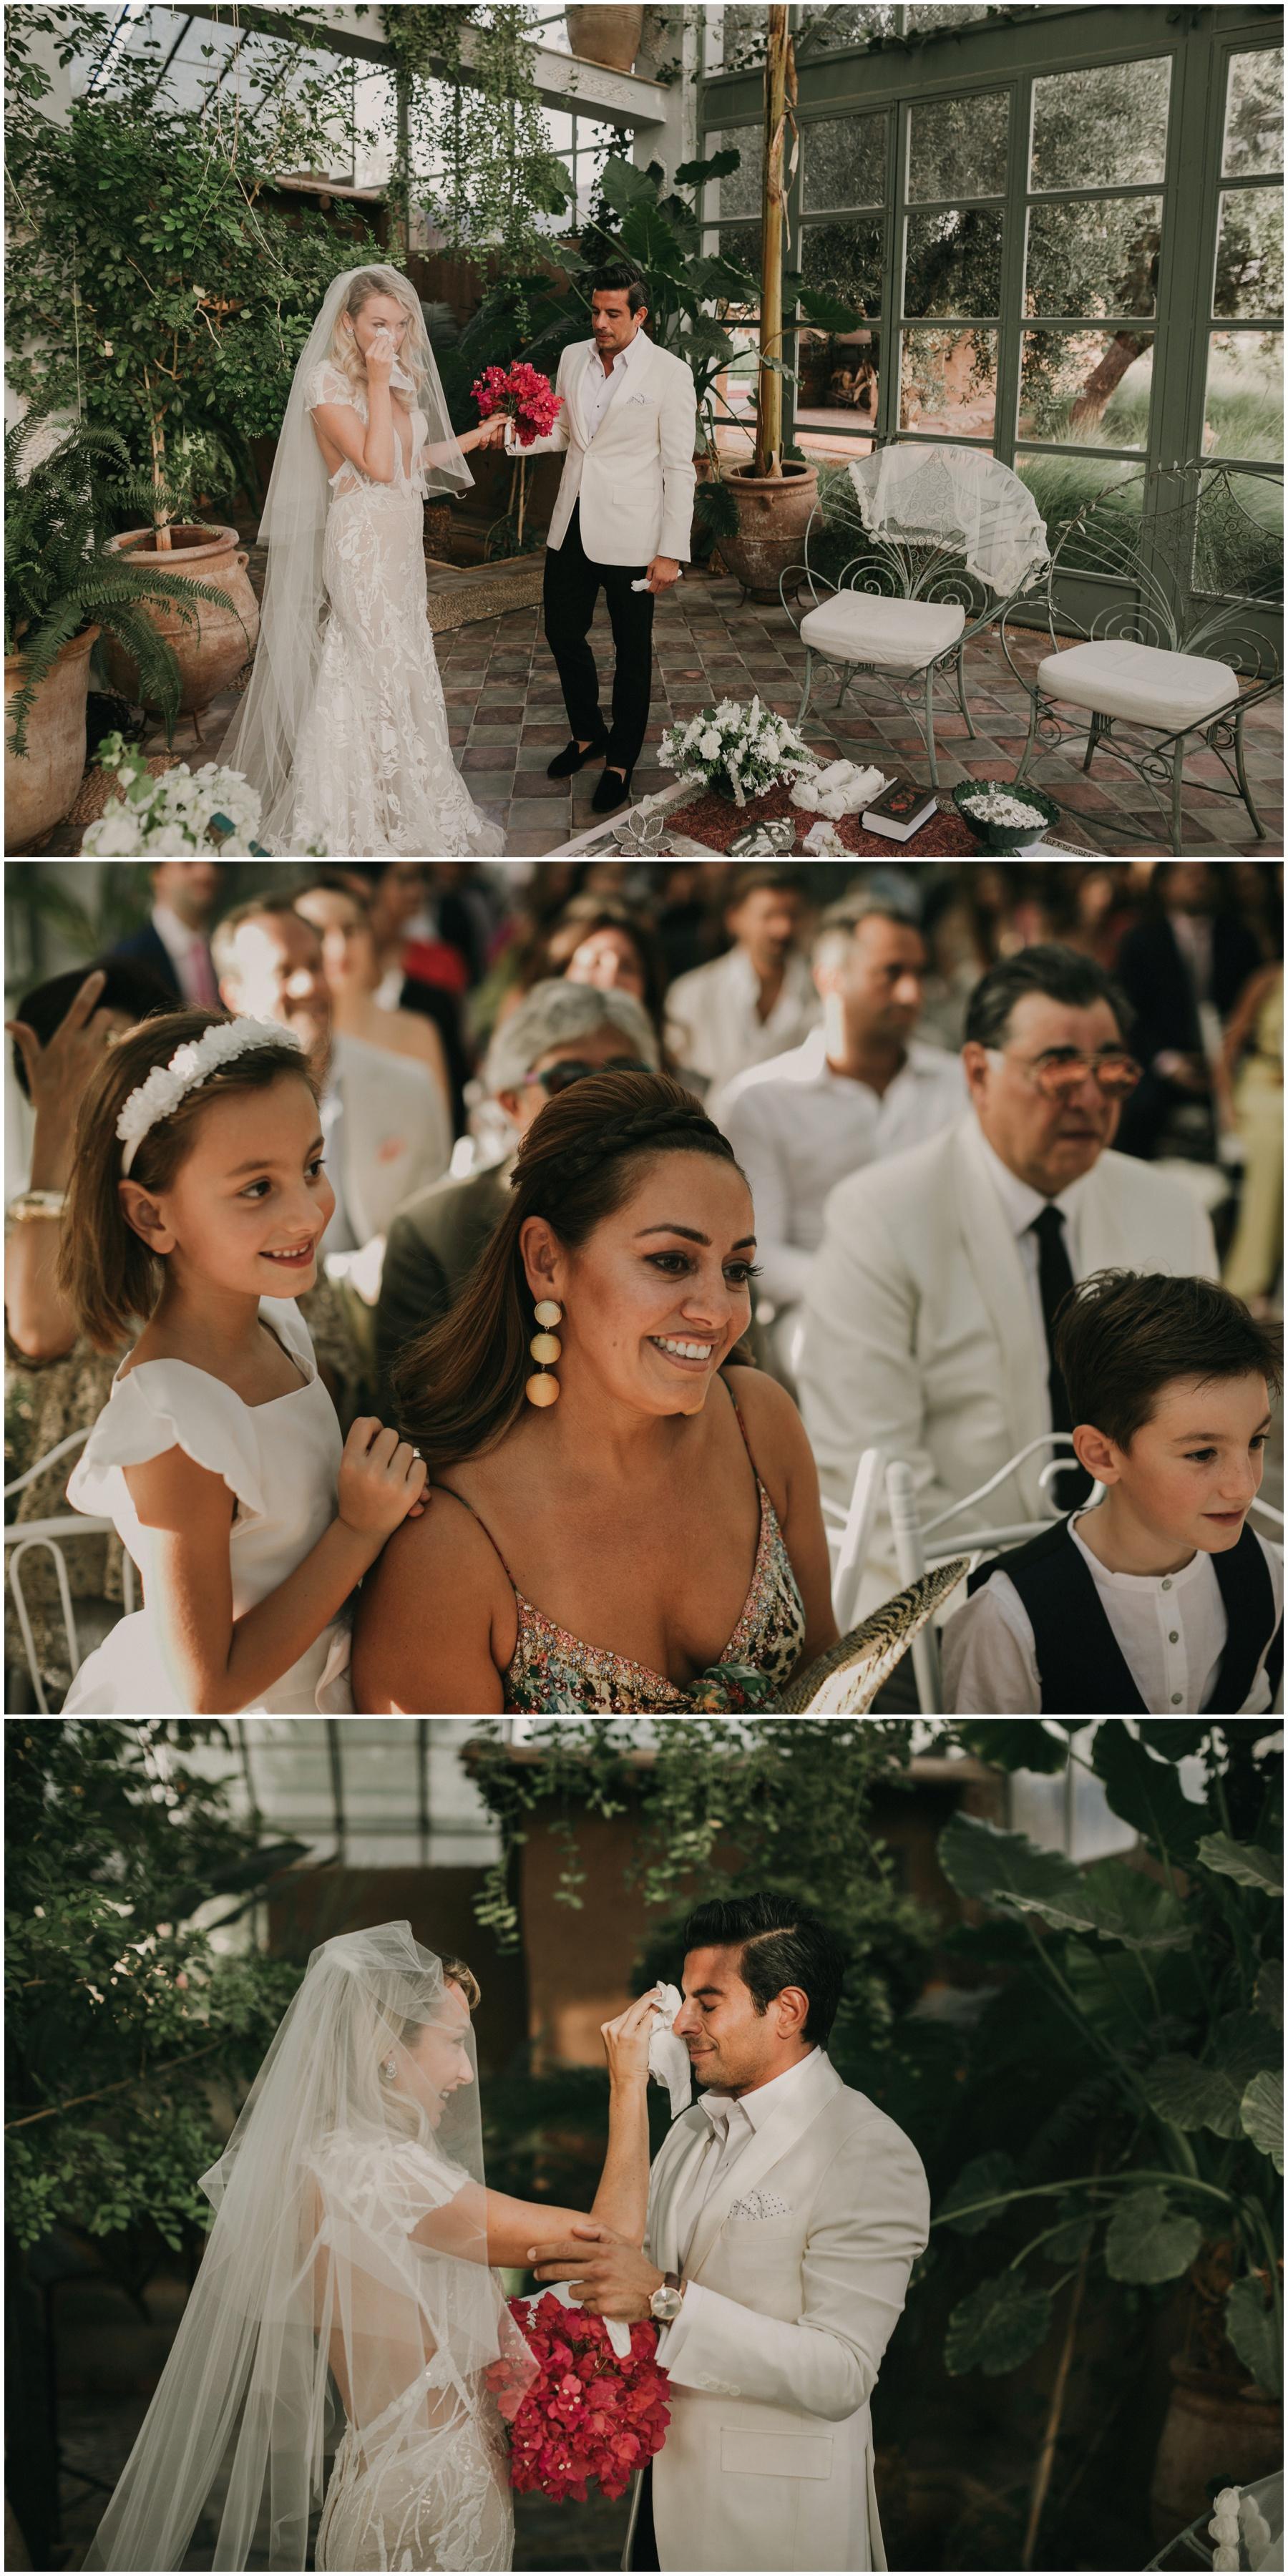 Marrakech Wedding Beldi Coutry Club 034.JPG